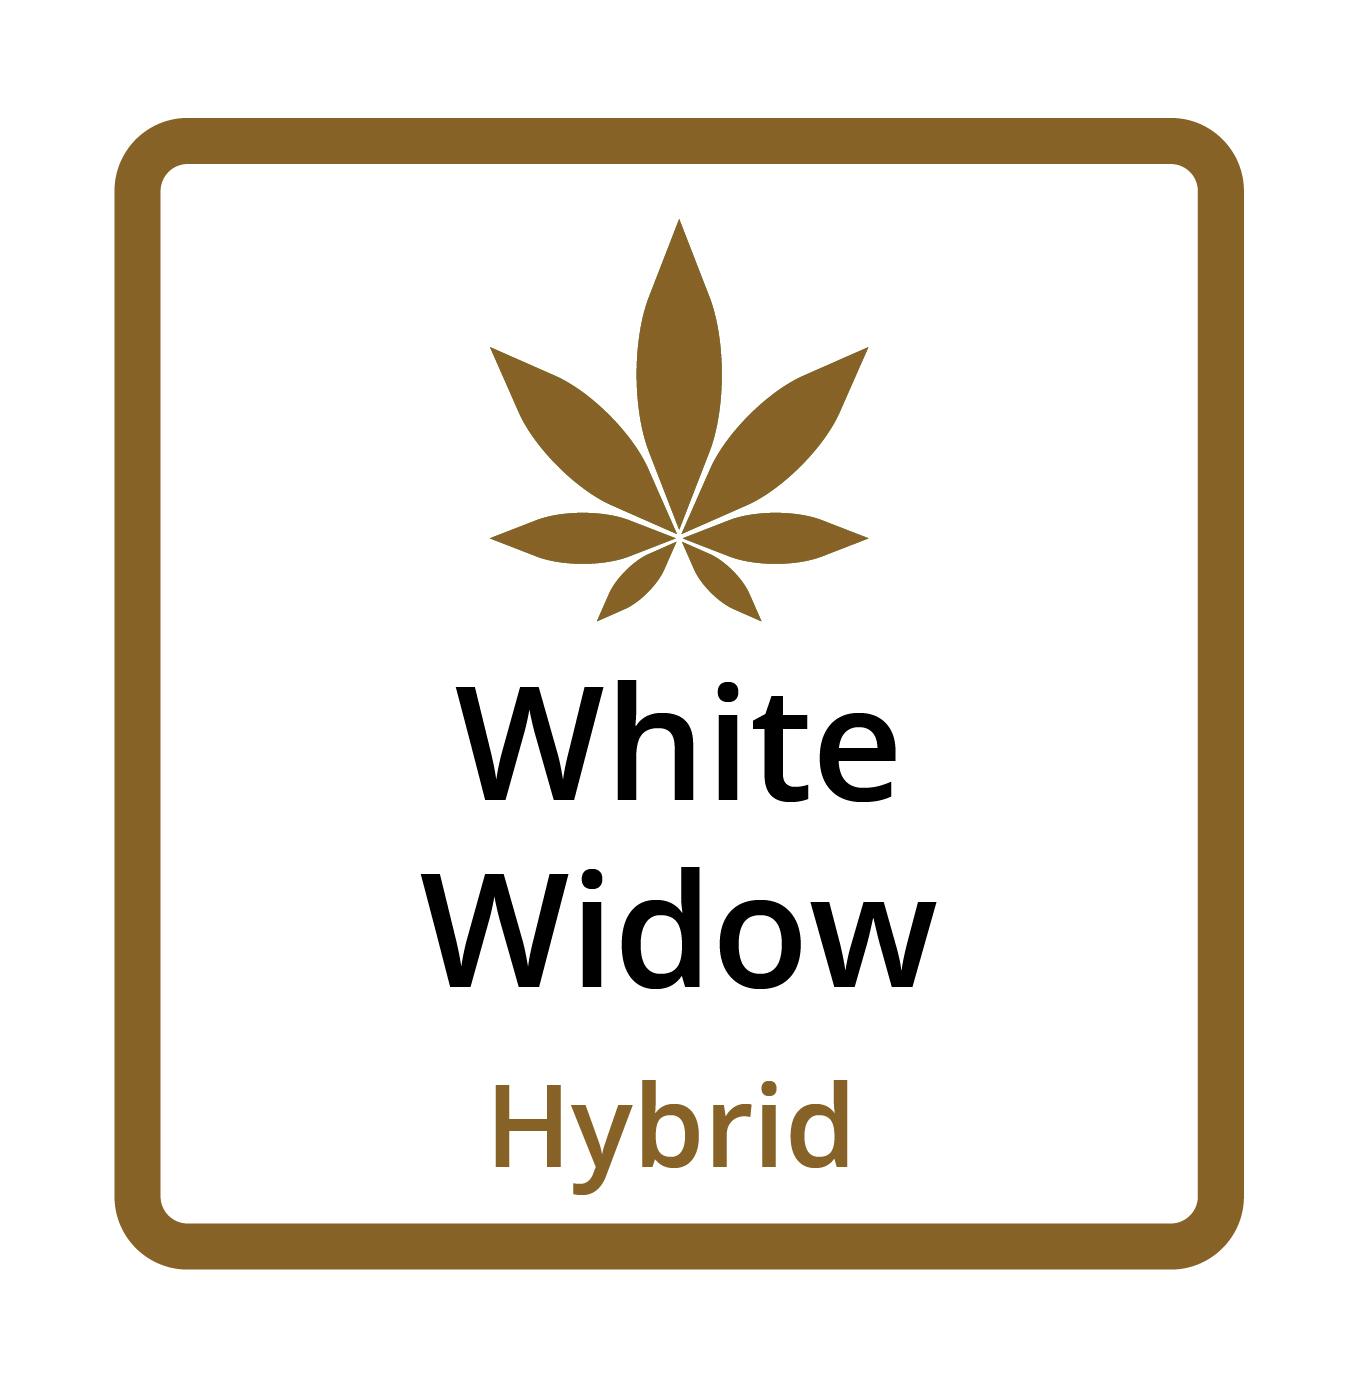 White Widow (Hybrid)